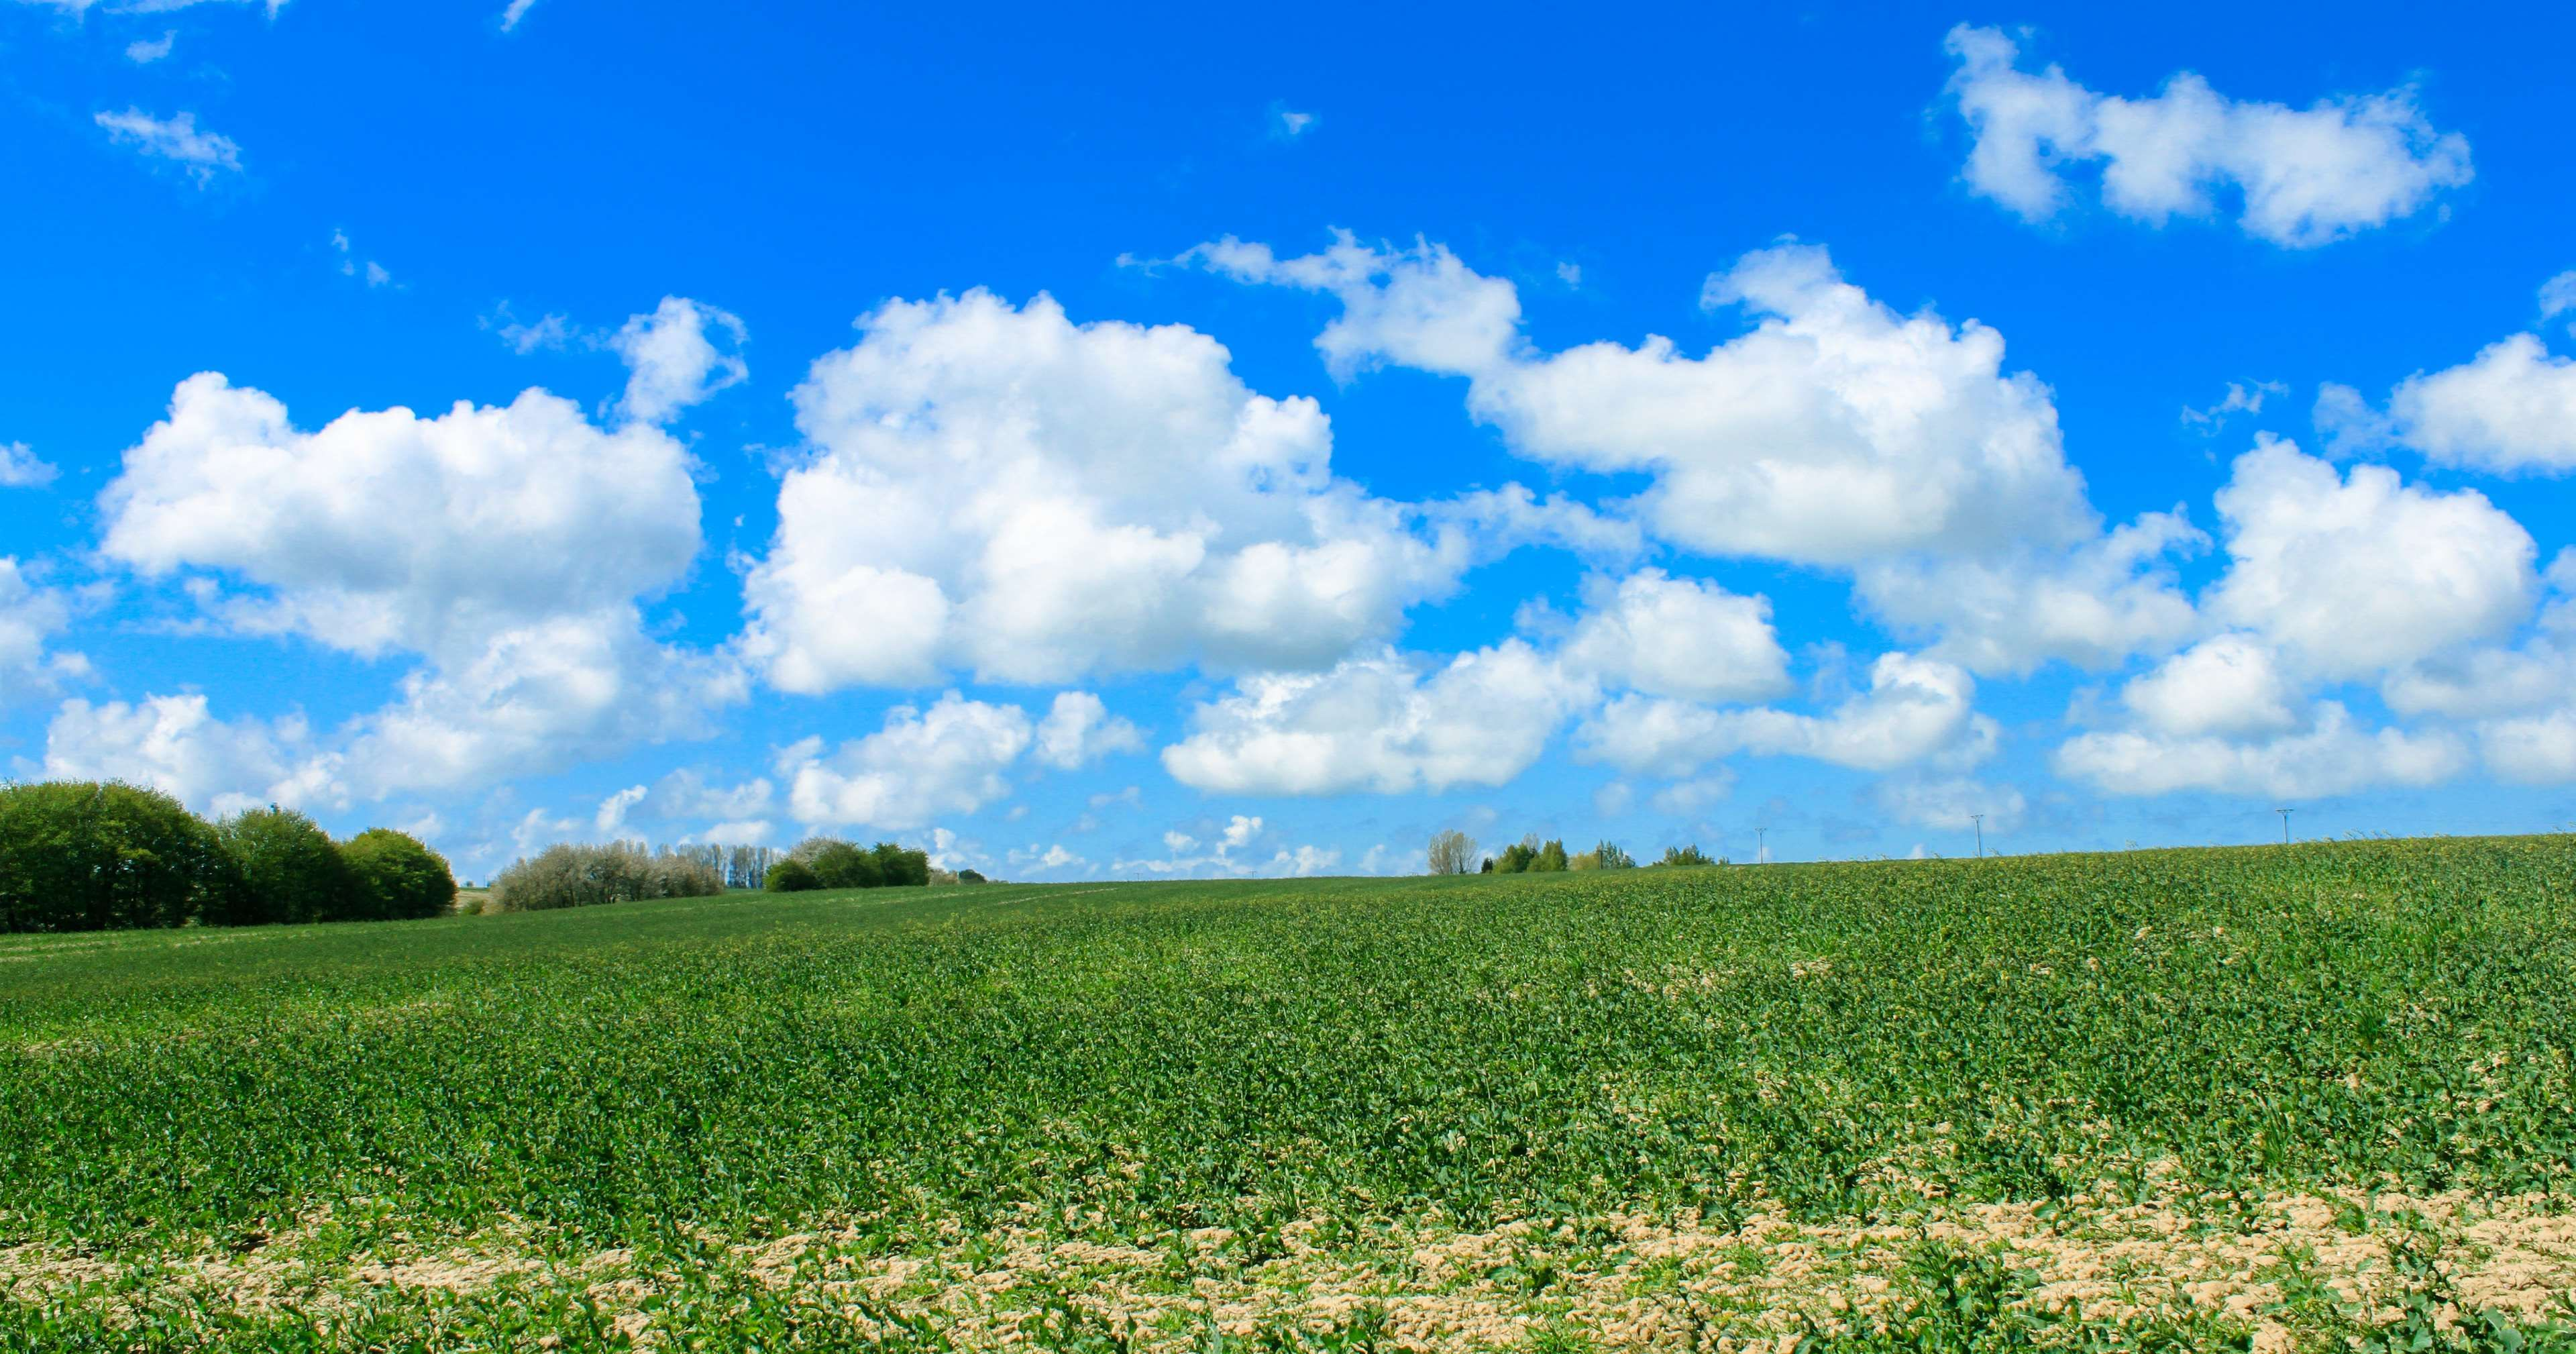 Clouds Farm Field Landscape Nature Sky Spring Trees 4k Wallpaper Landscape Clouds Nature